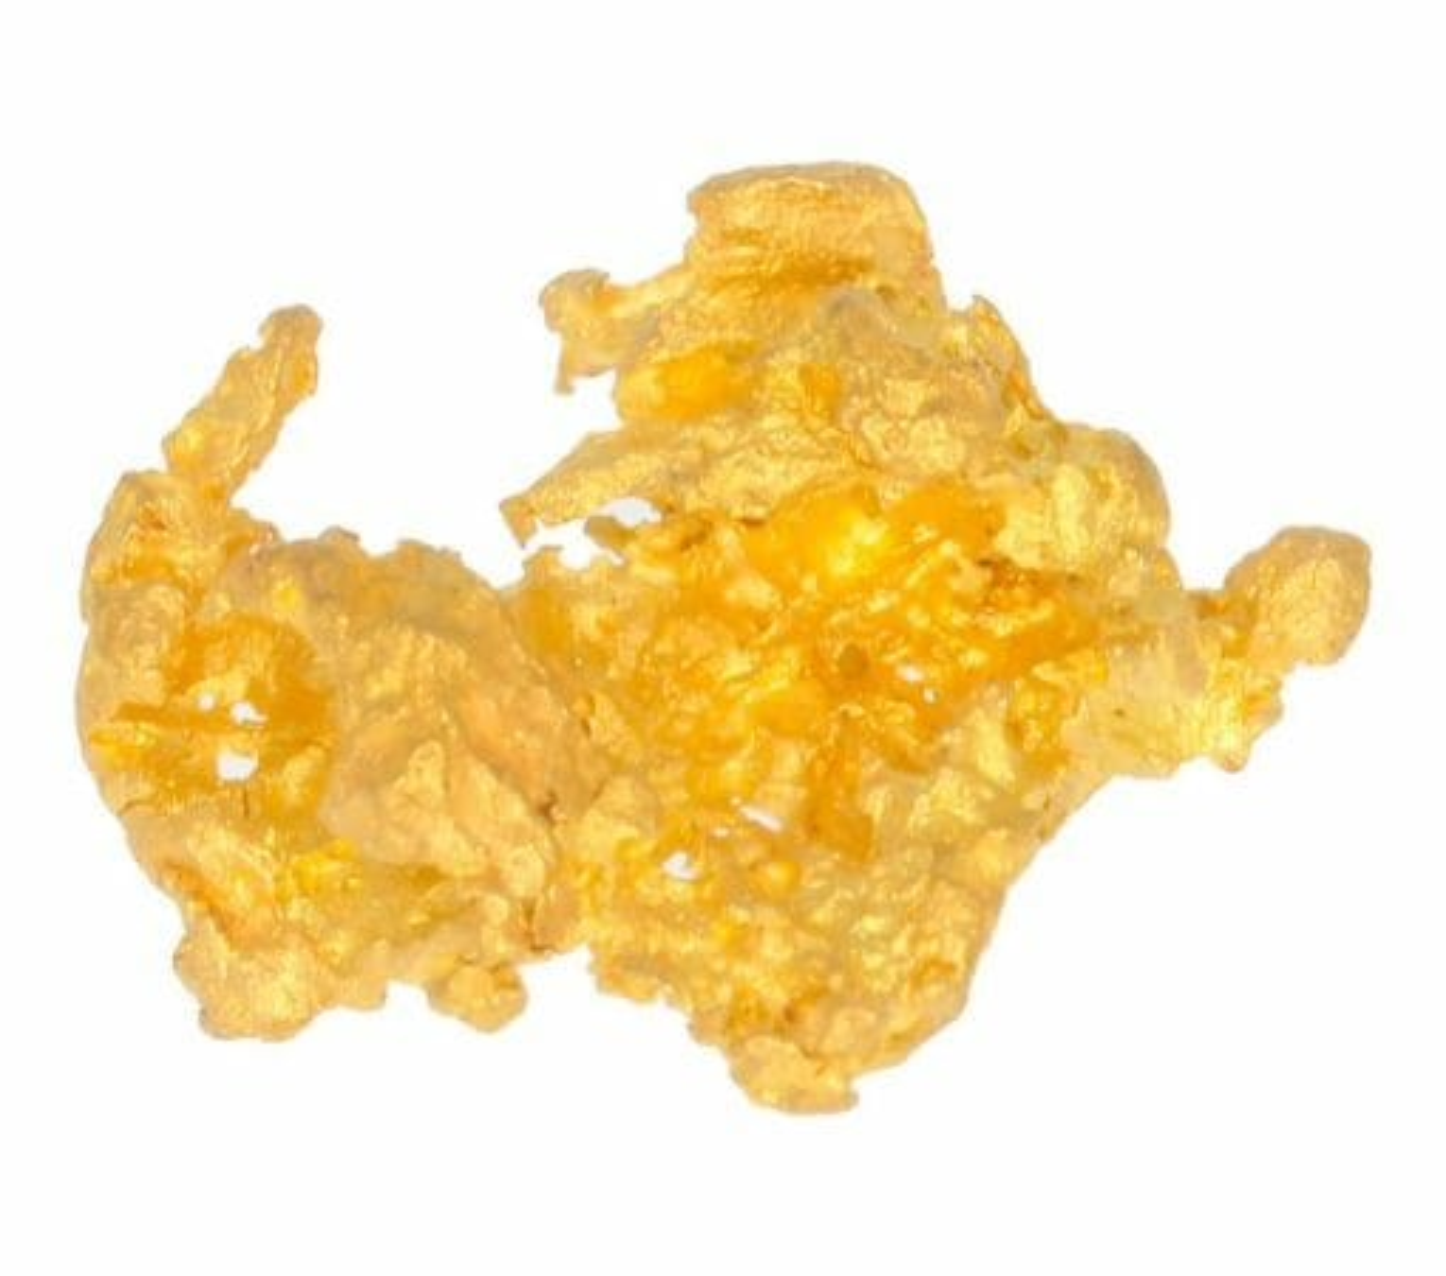 Natural Western Australian Gold Nugget - 1.56g 9